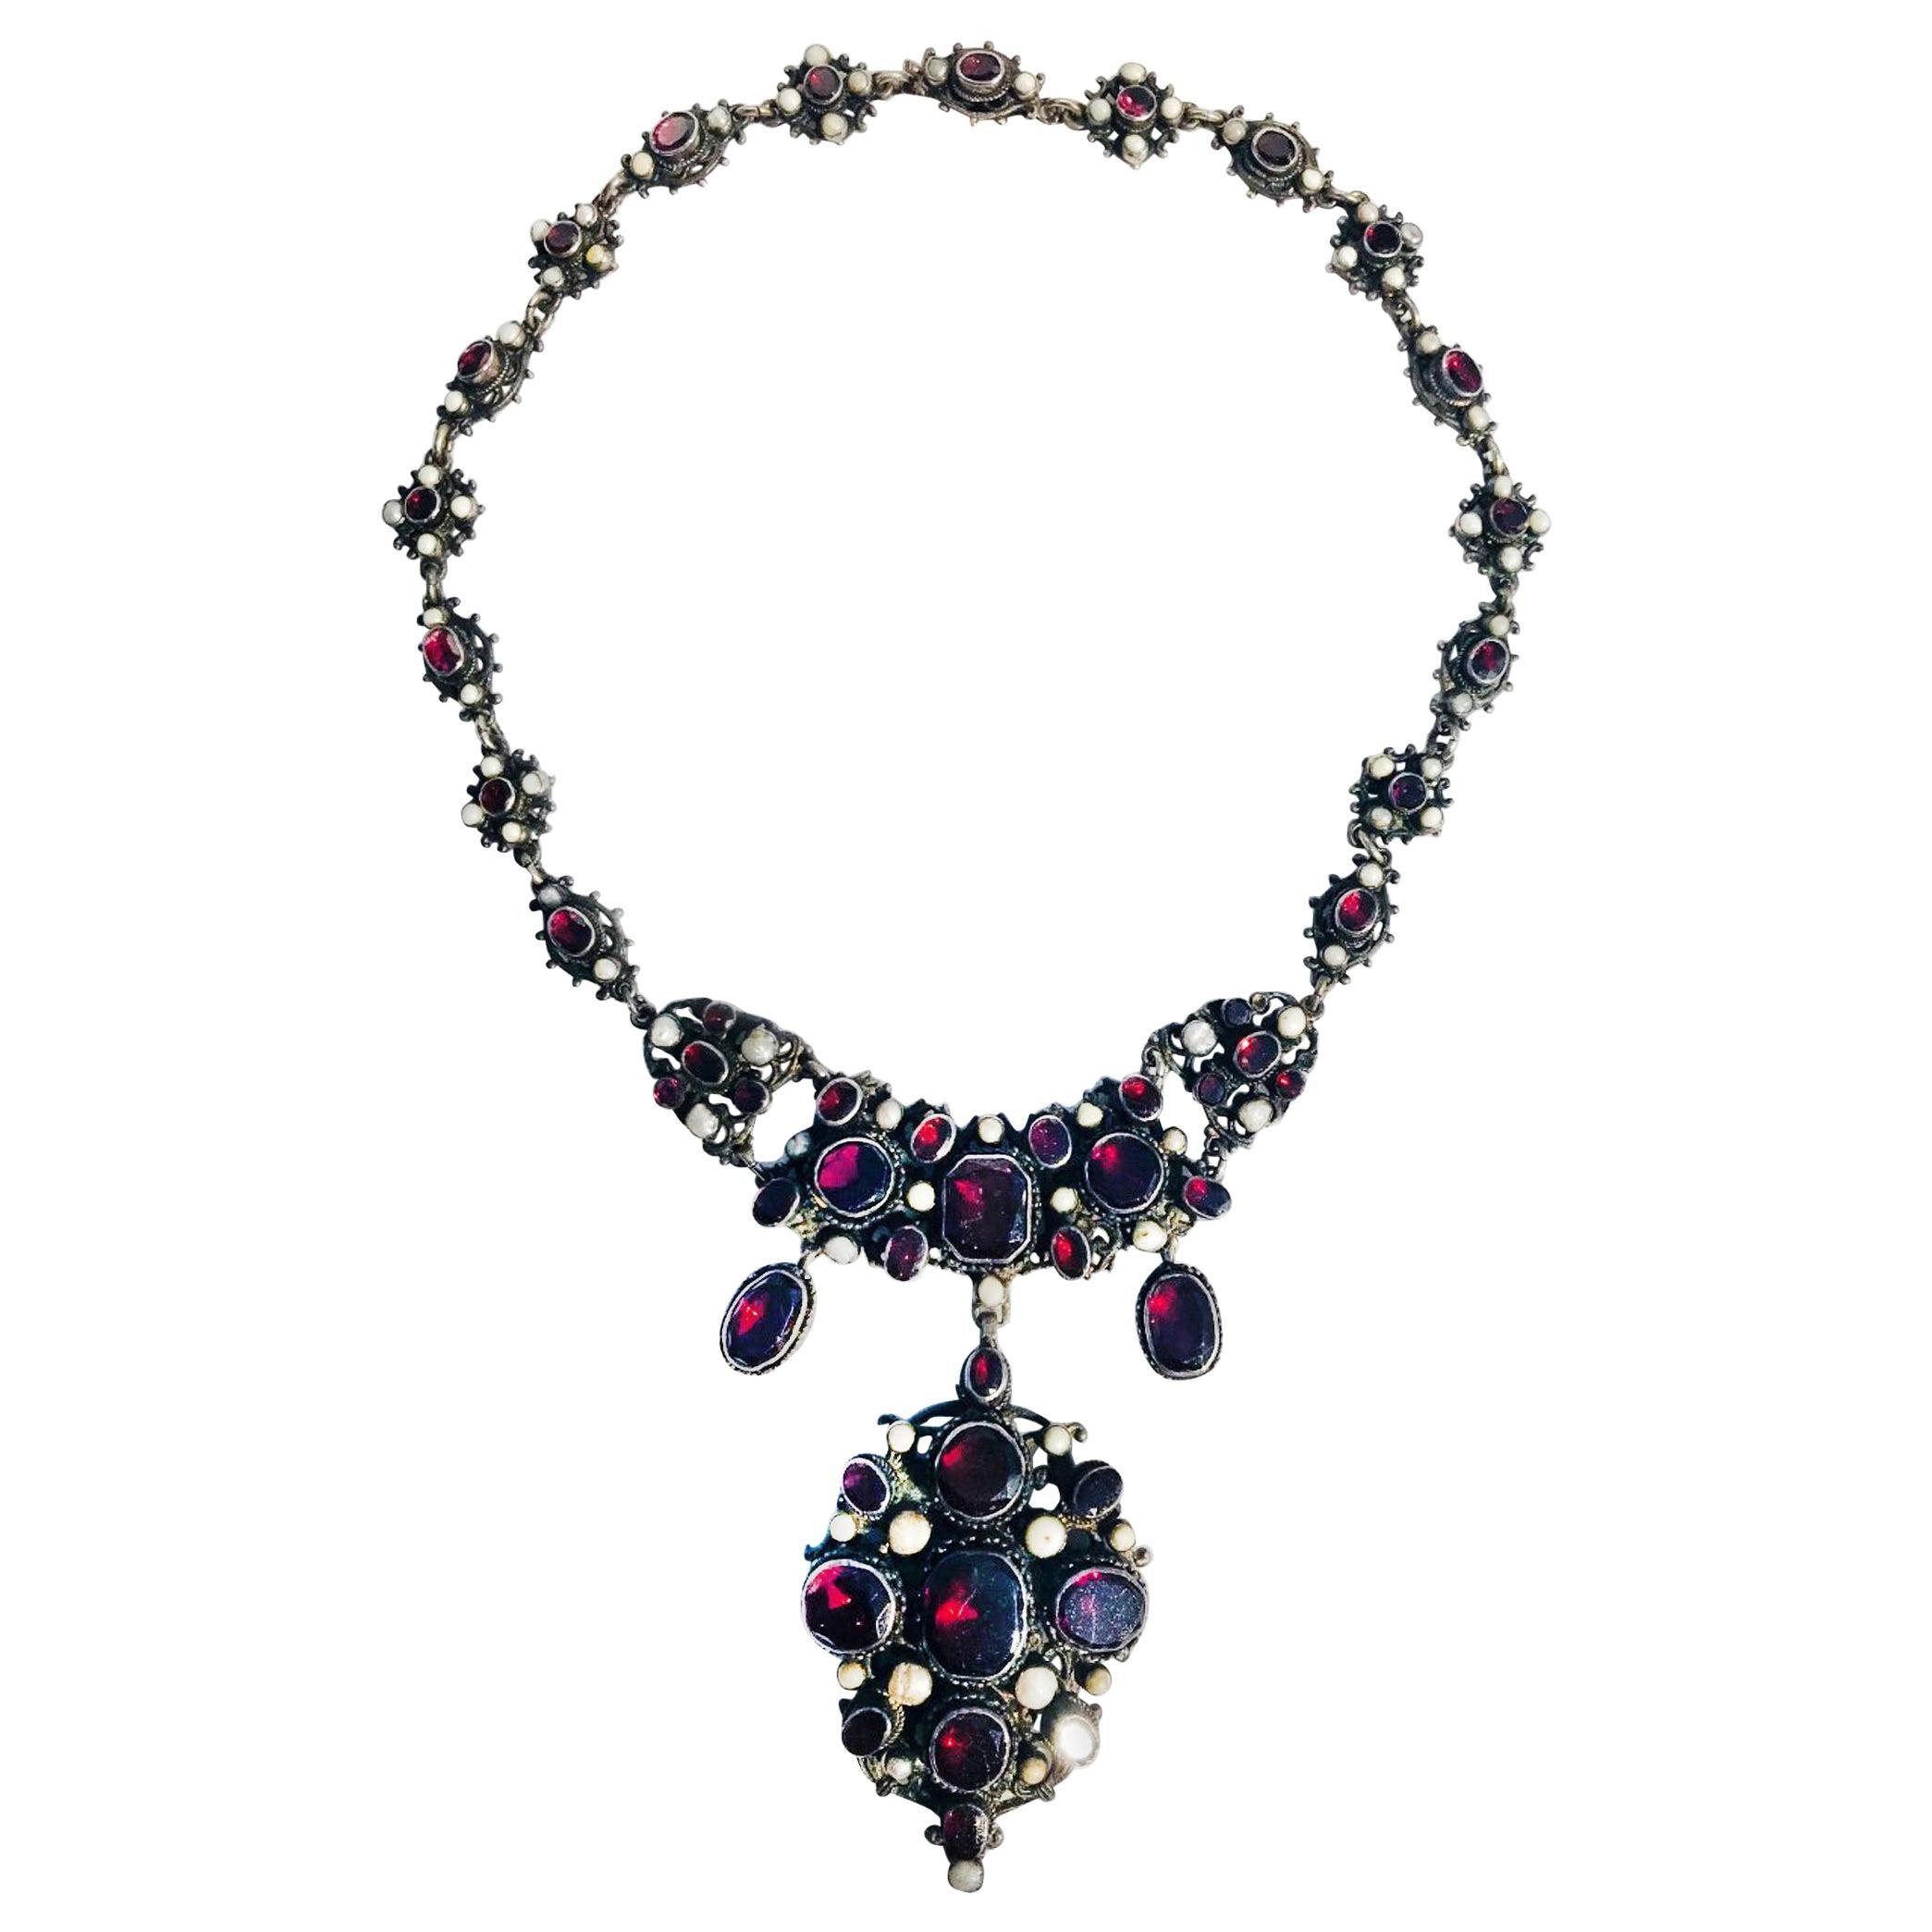 Victorian English Bib Necklace Garnets with Pearl Accents, circa 1870